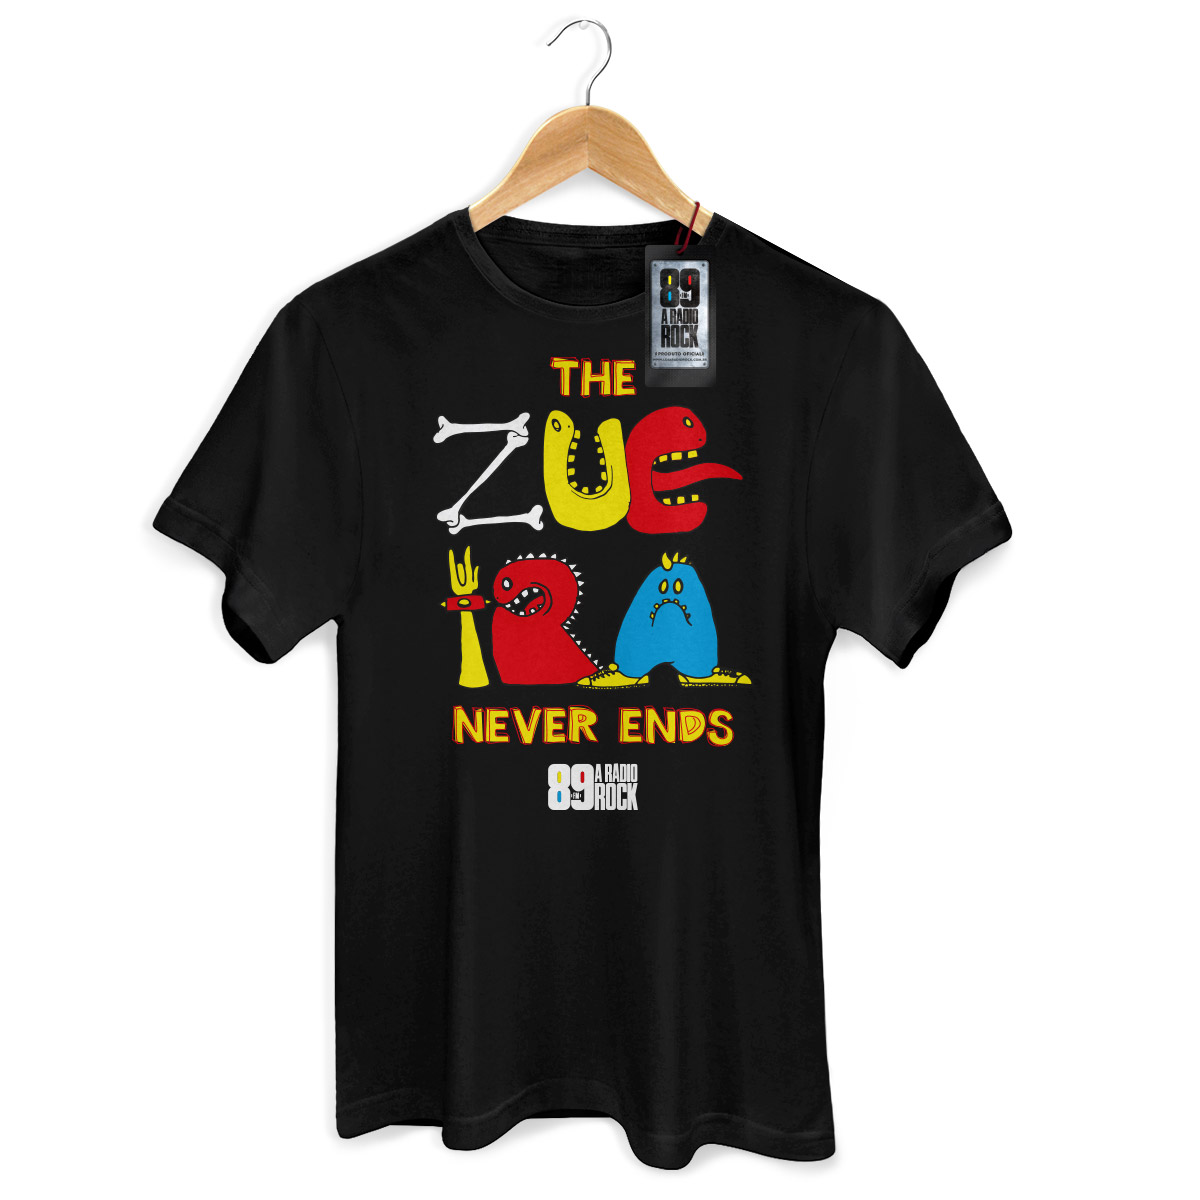 Camiseta Masculina 89FM A Rádio Rock Monster Type